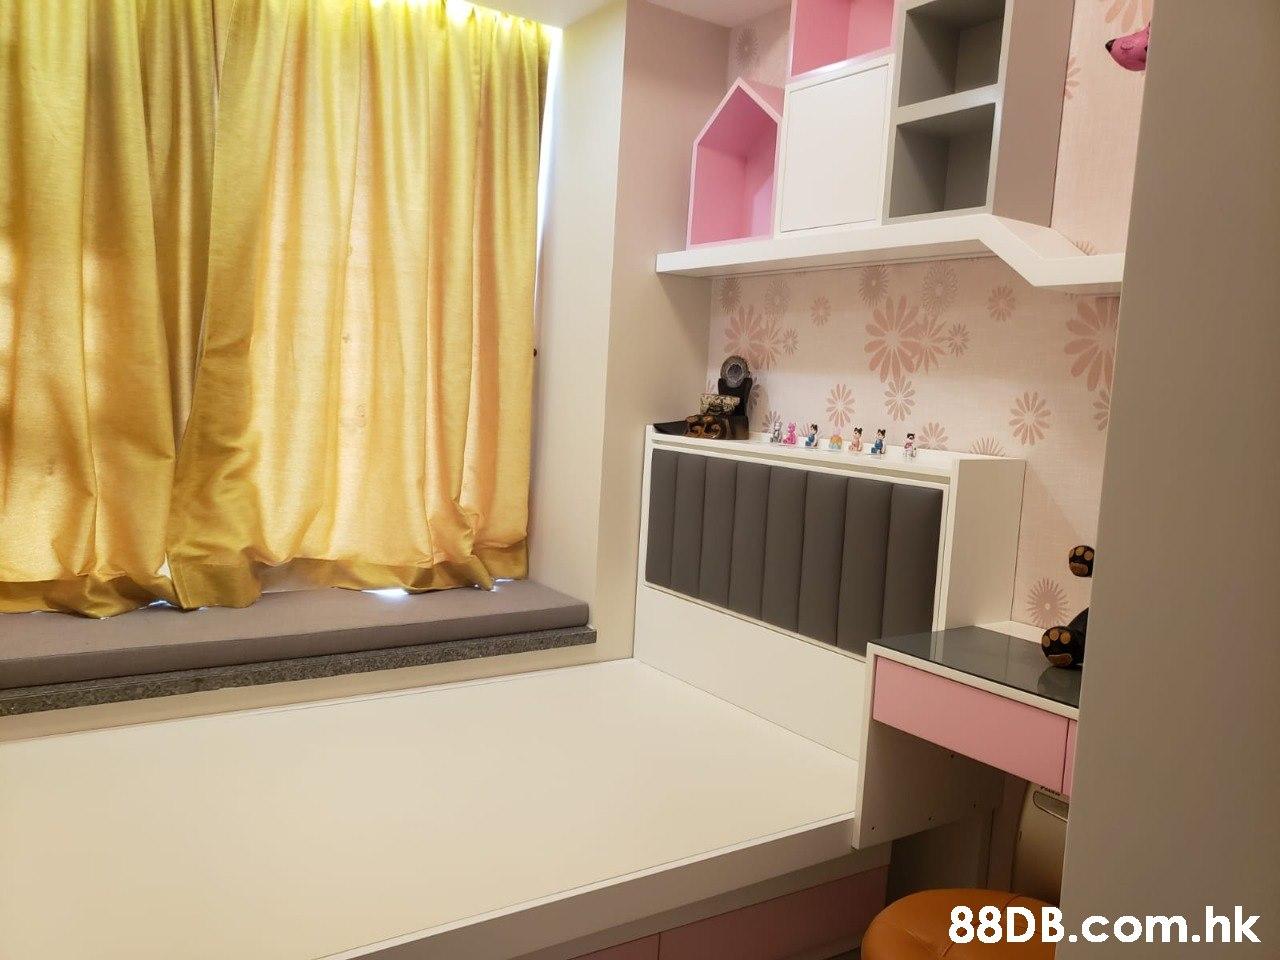 .hk  Property,Room,Interior design,Curtain,Pink